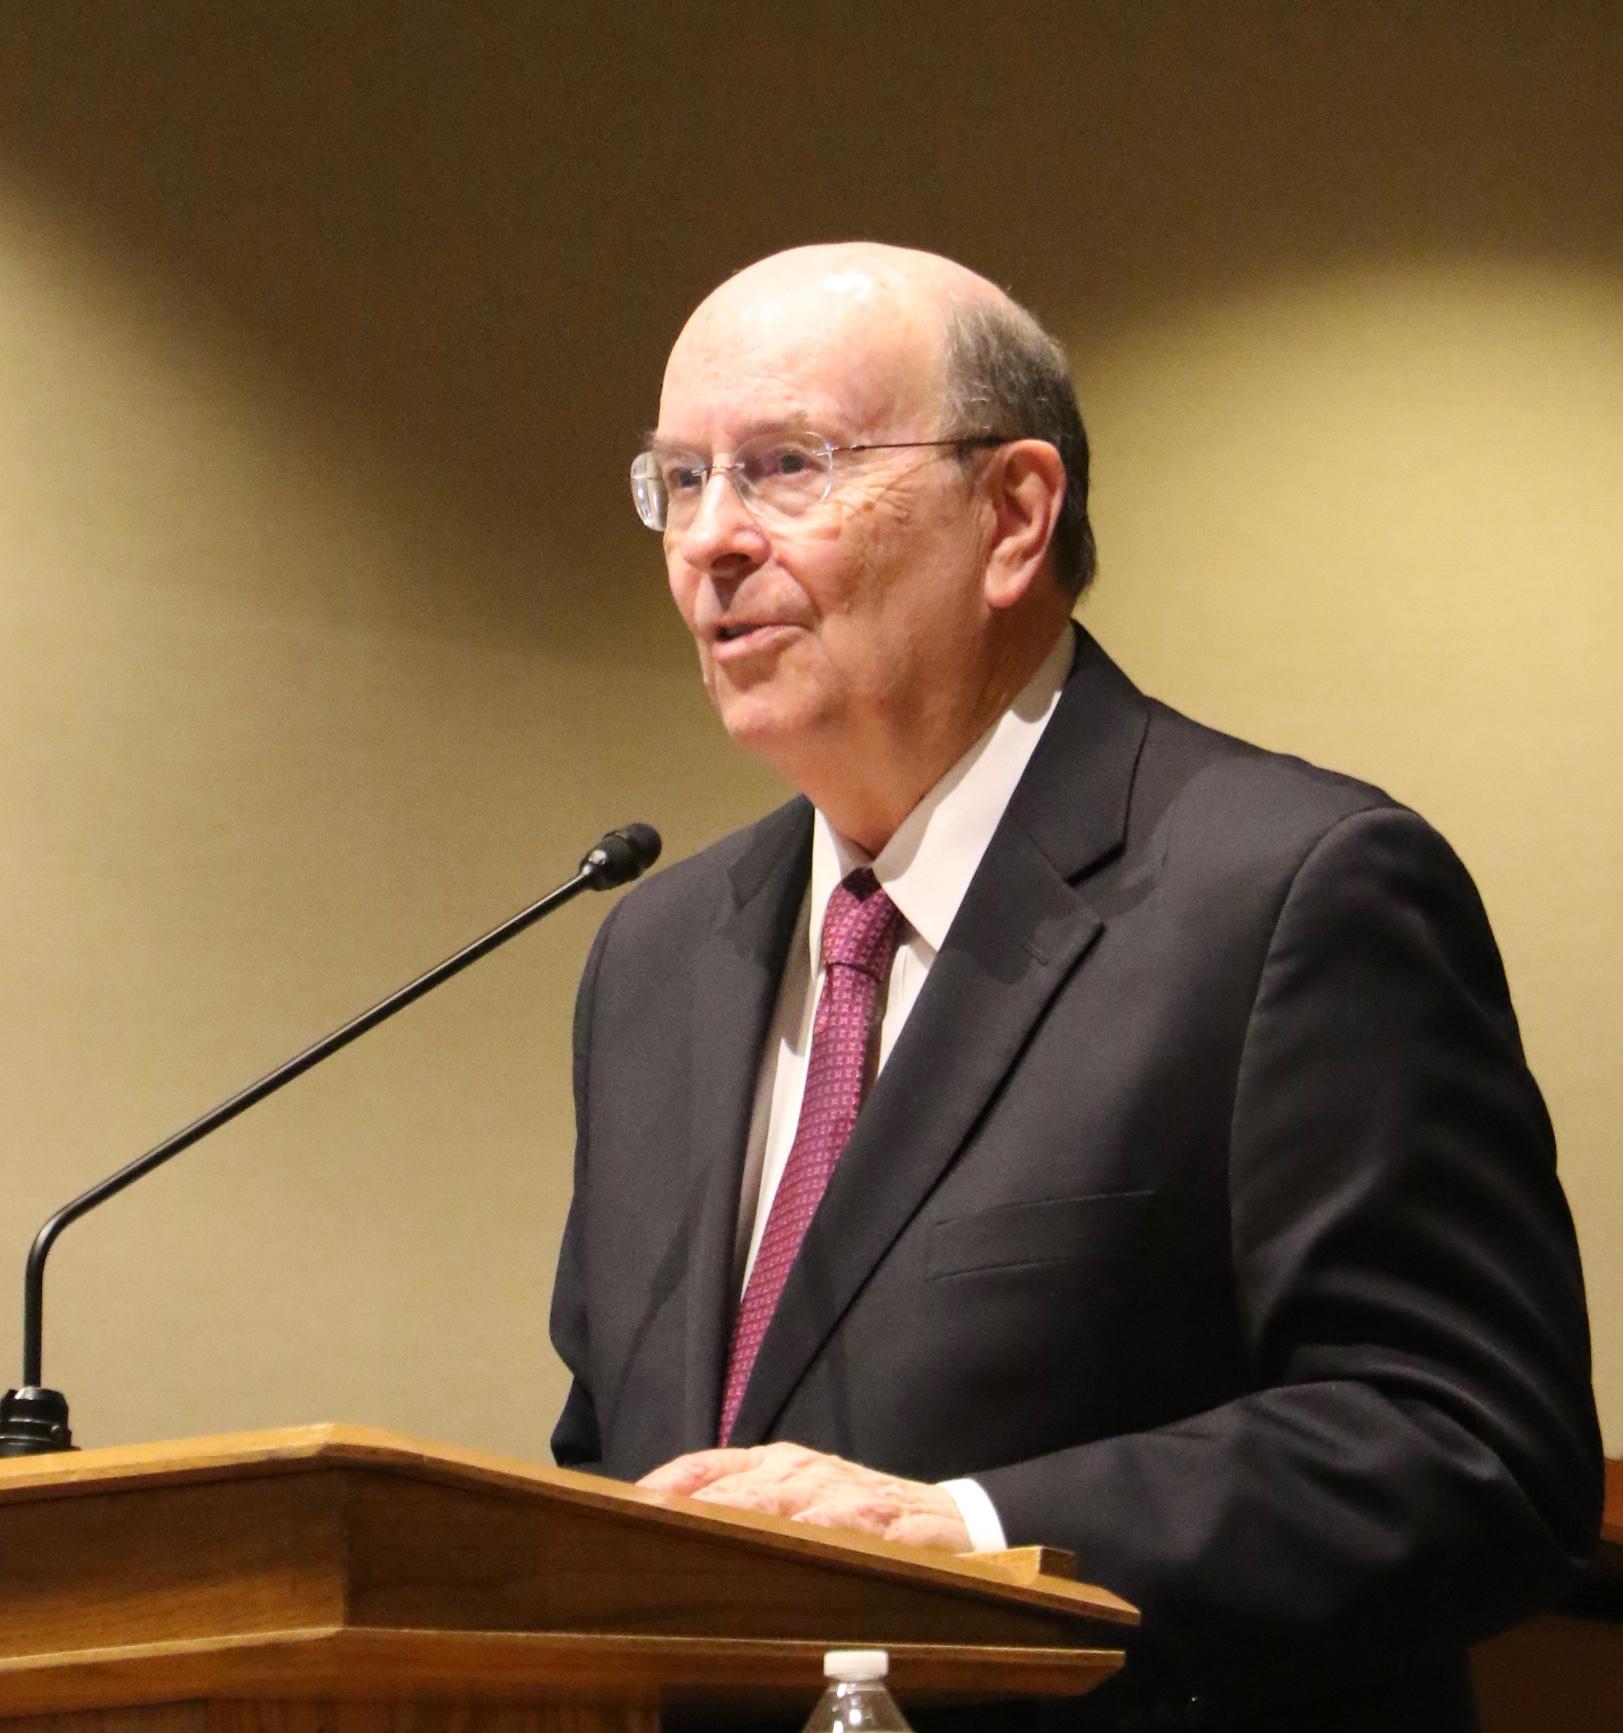 Elder Quentin L. Cook of the Quorum of the Twelve Apostles speaks during a Friday, Feb. 1, 2019, devotional at the Utah Valley Institute on the Utah Valley University campus in Orem, Utah.